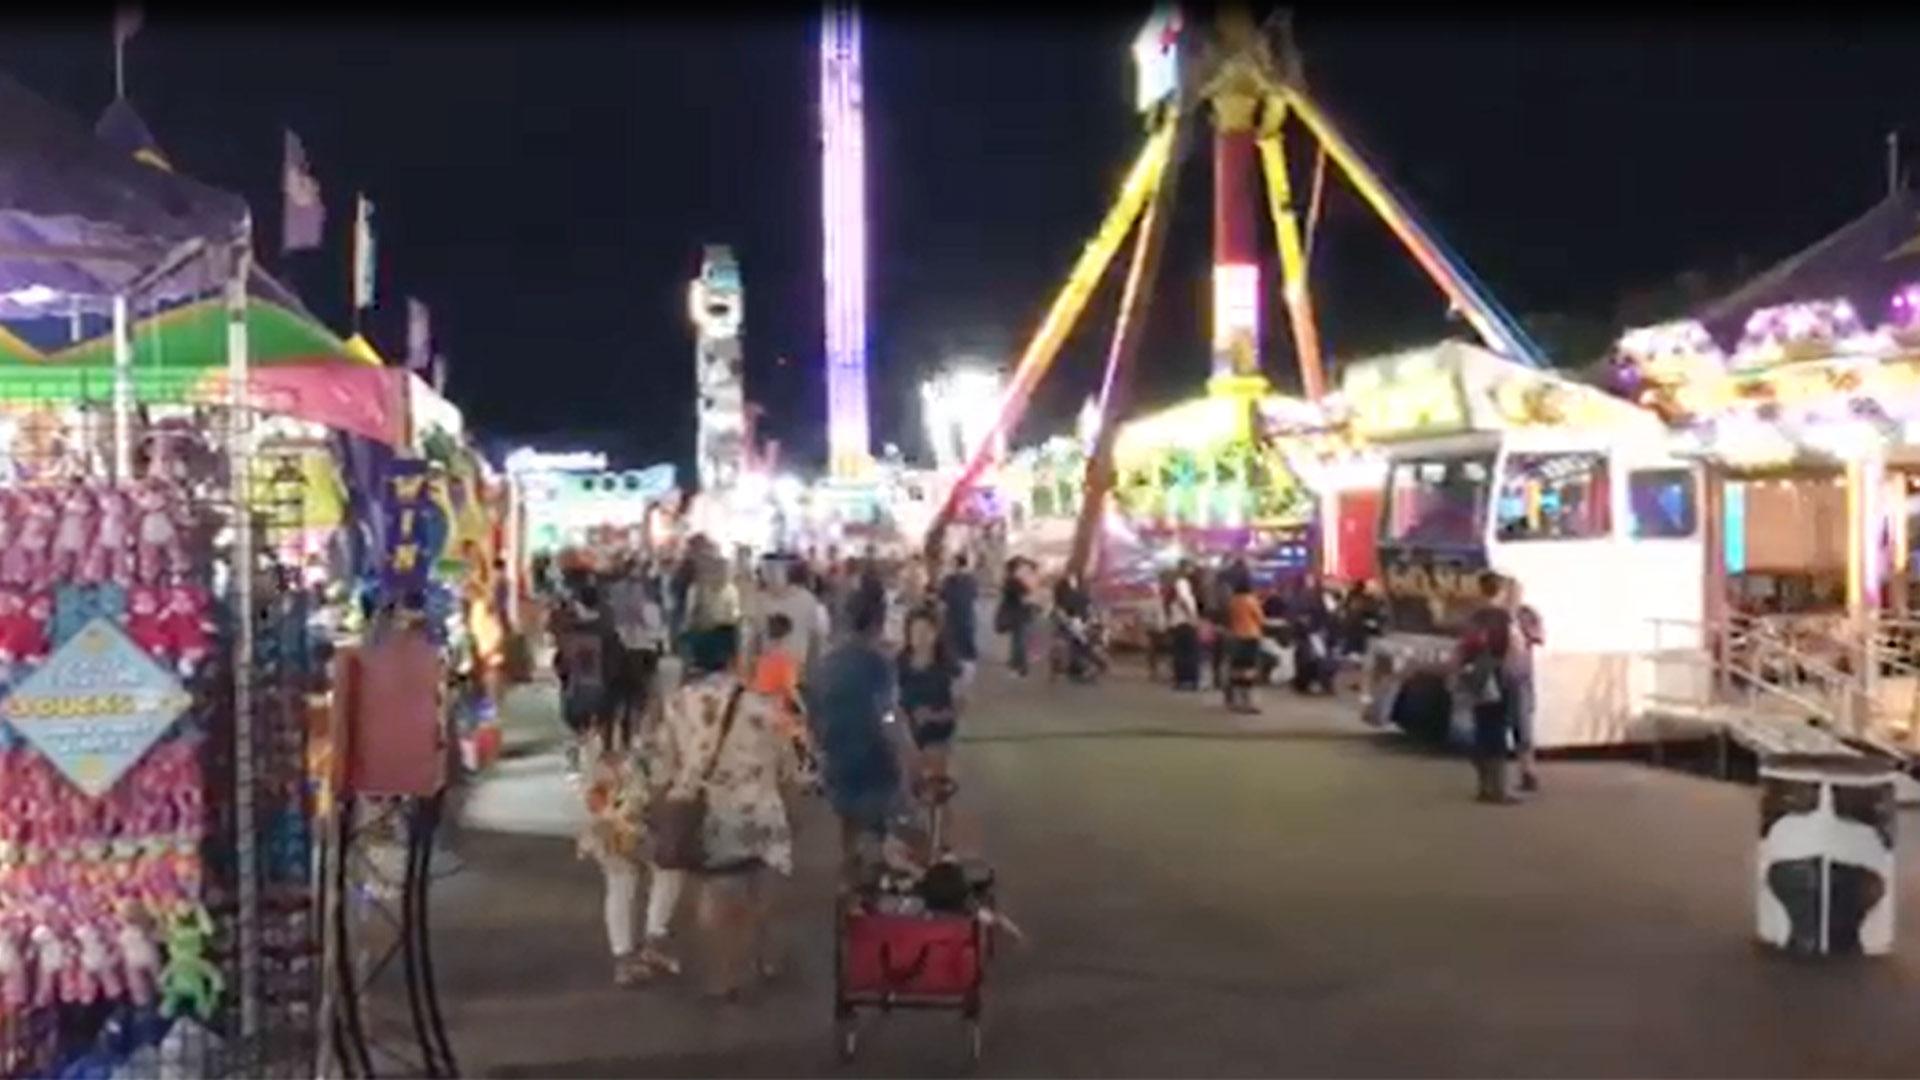 KELO South Dakota State Fair 2018